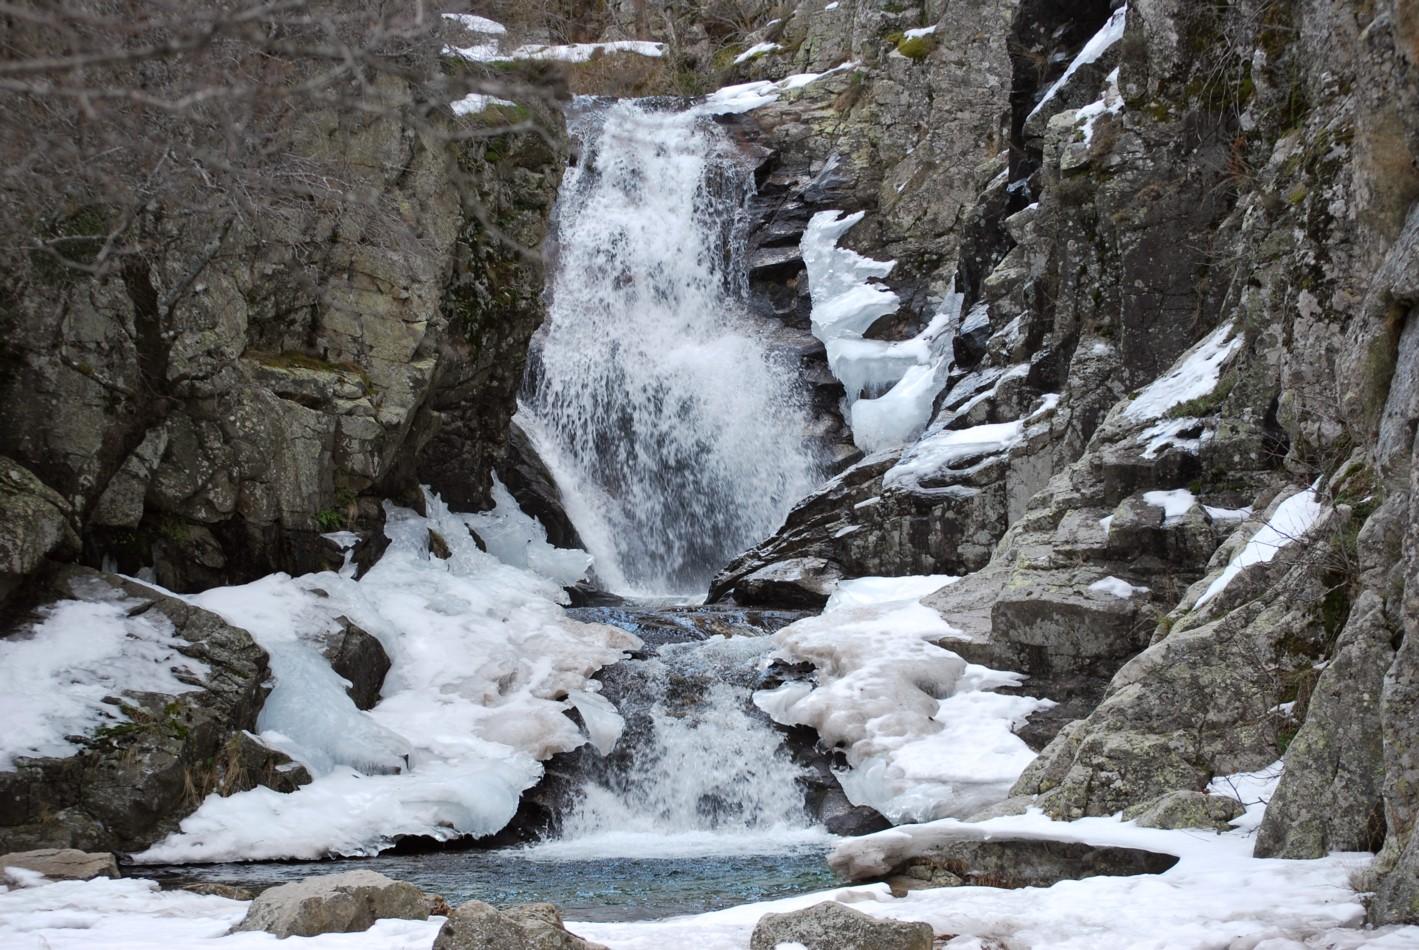 cascada-del-purgatorio.jpg - 458.52 KB